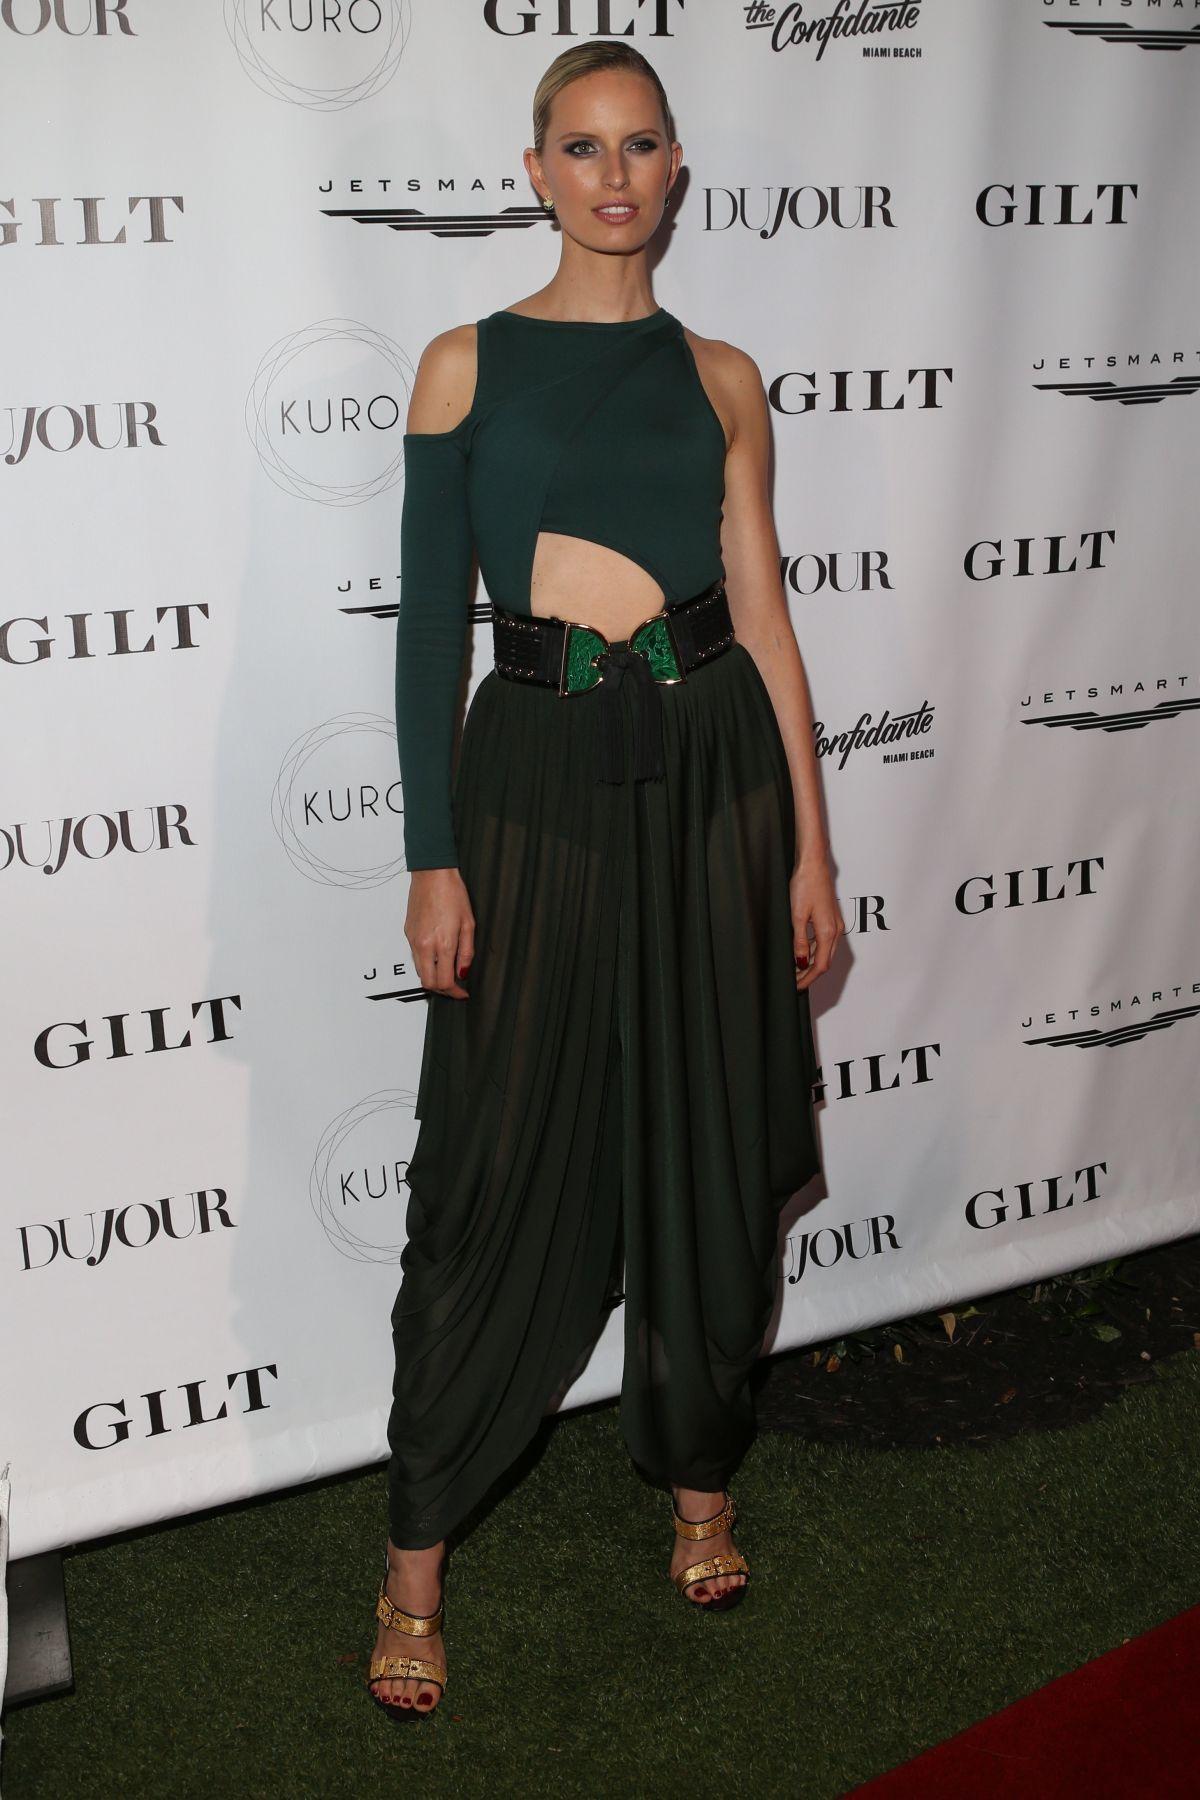 KAROLINA KURKOVA at Dujour Media, Gilt & Jetsmarter Party in Miami 12/01/2016